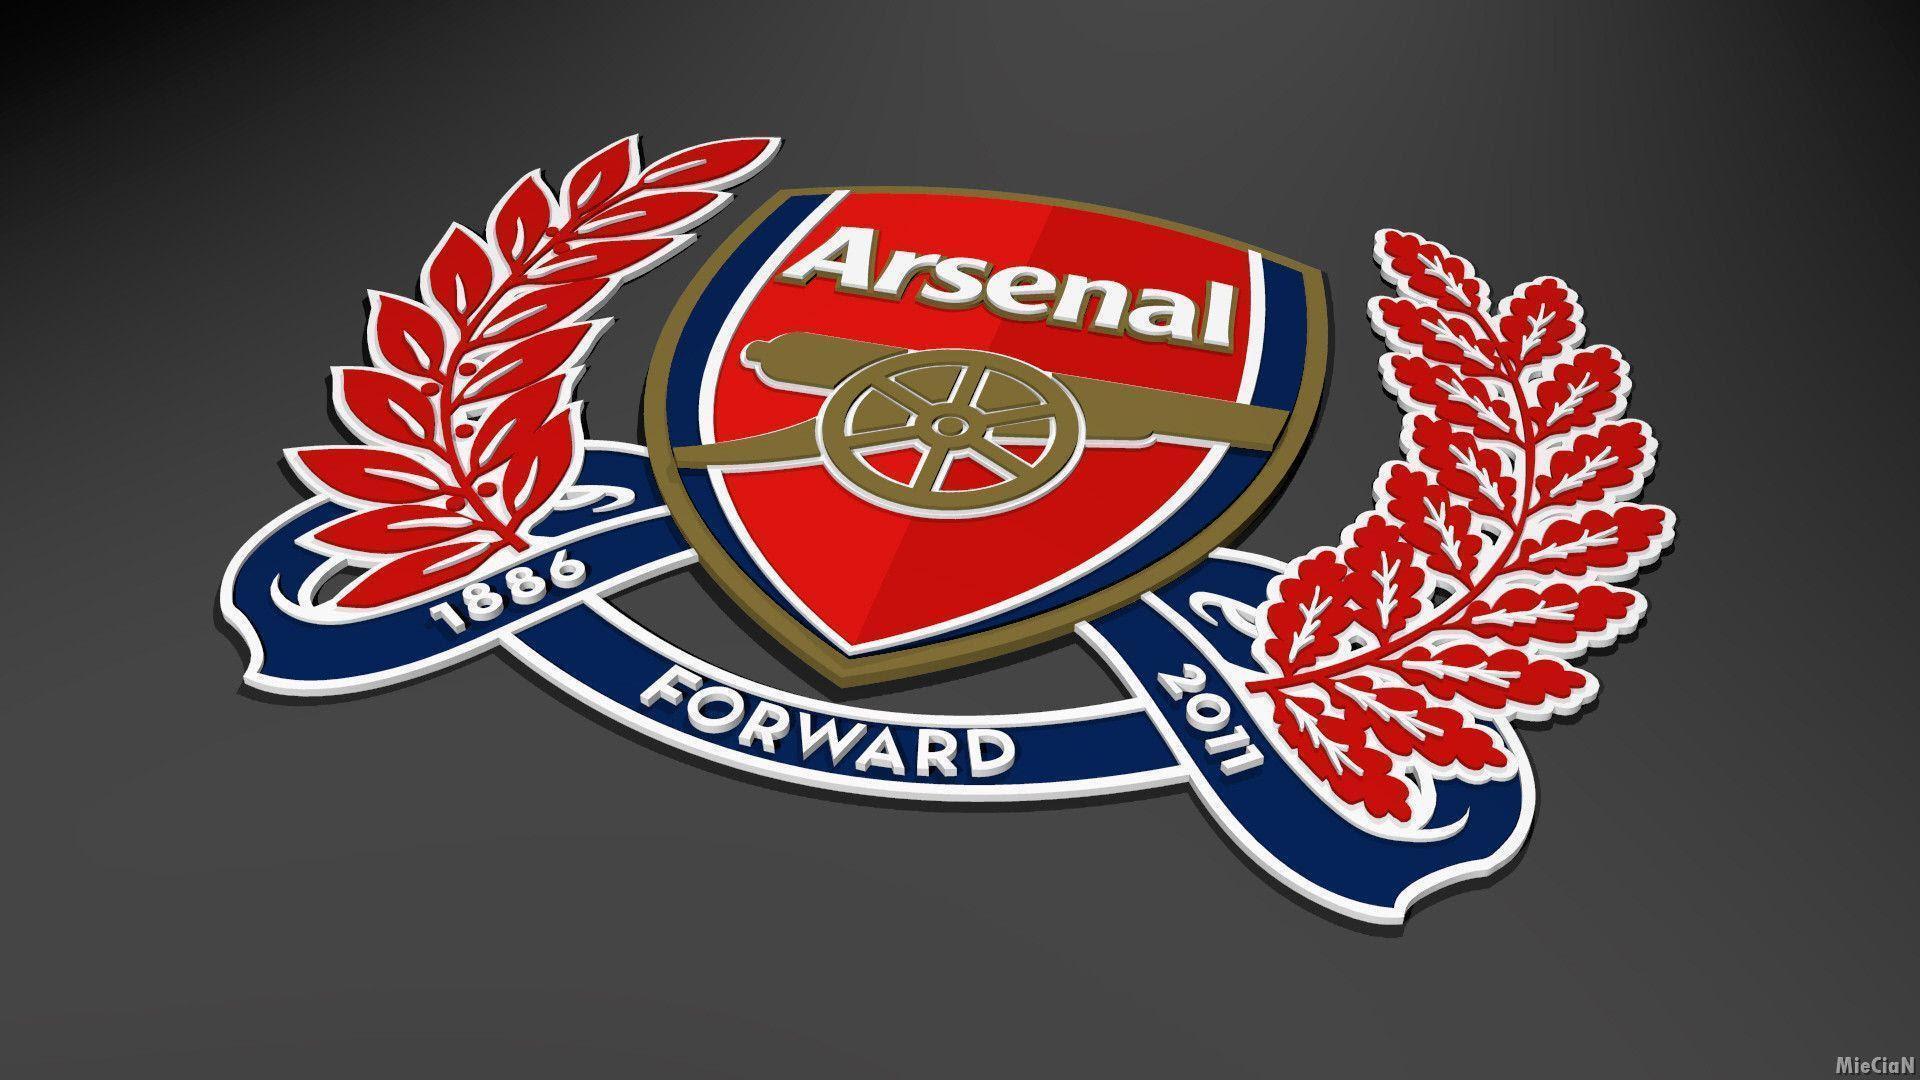 Arsenal Logo Wallpapers - Wallpaper Cave